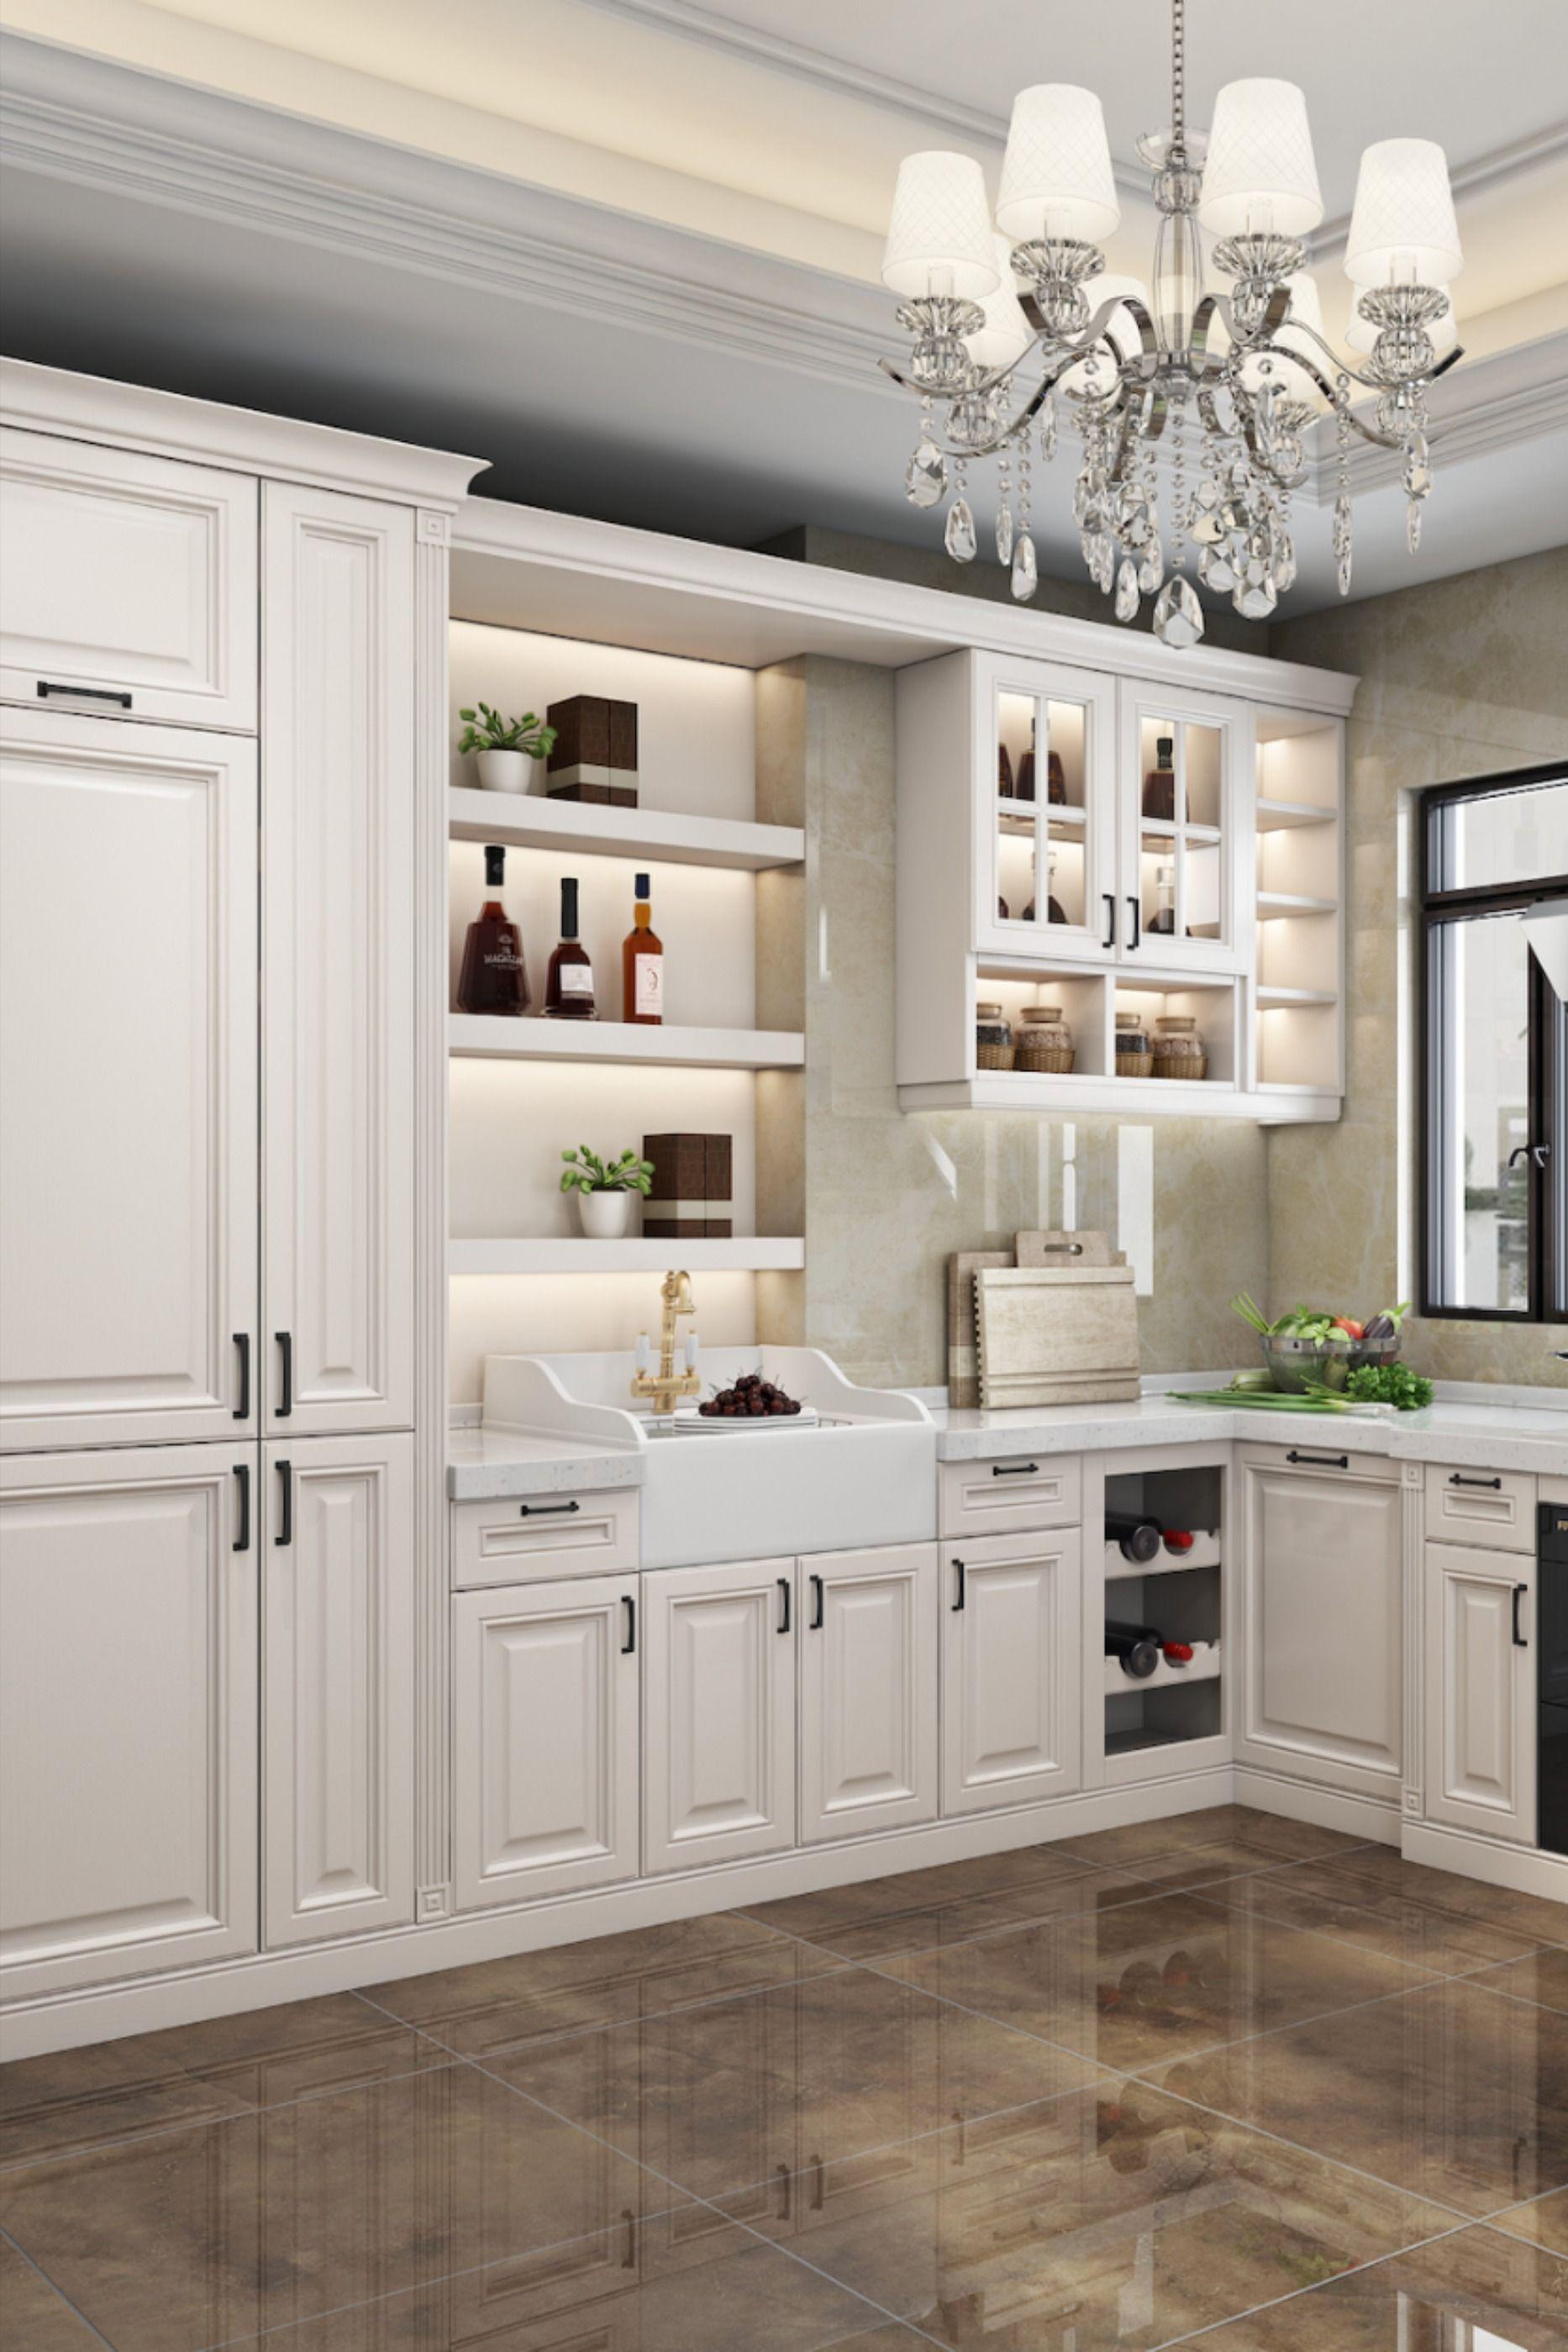 Pvc Blister Kitchen Cabinet Kitchen Cabinets Kitchen Cabinet Styles European Kitchen Cabinets